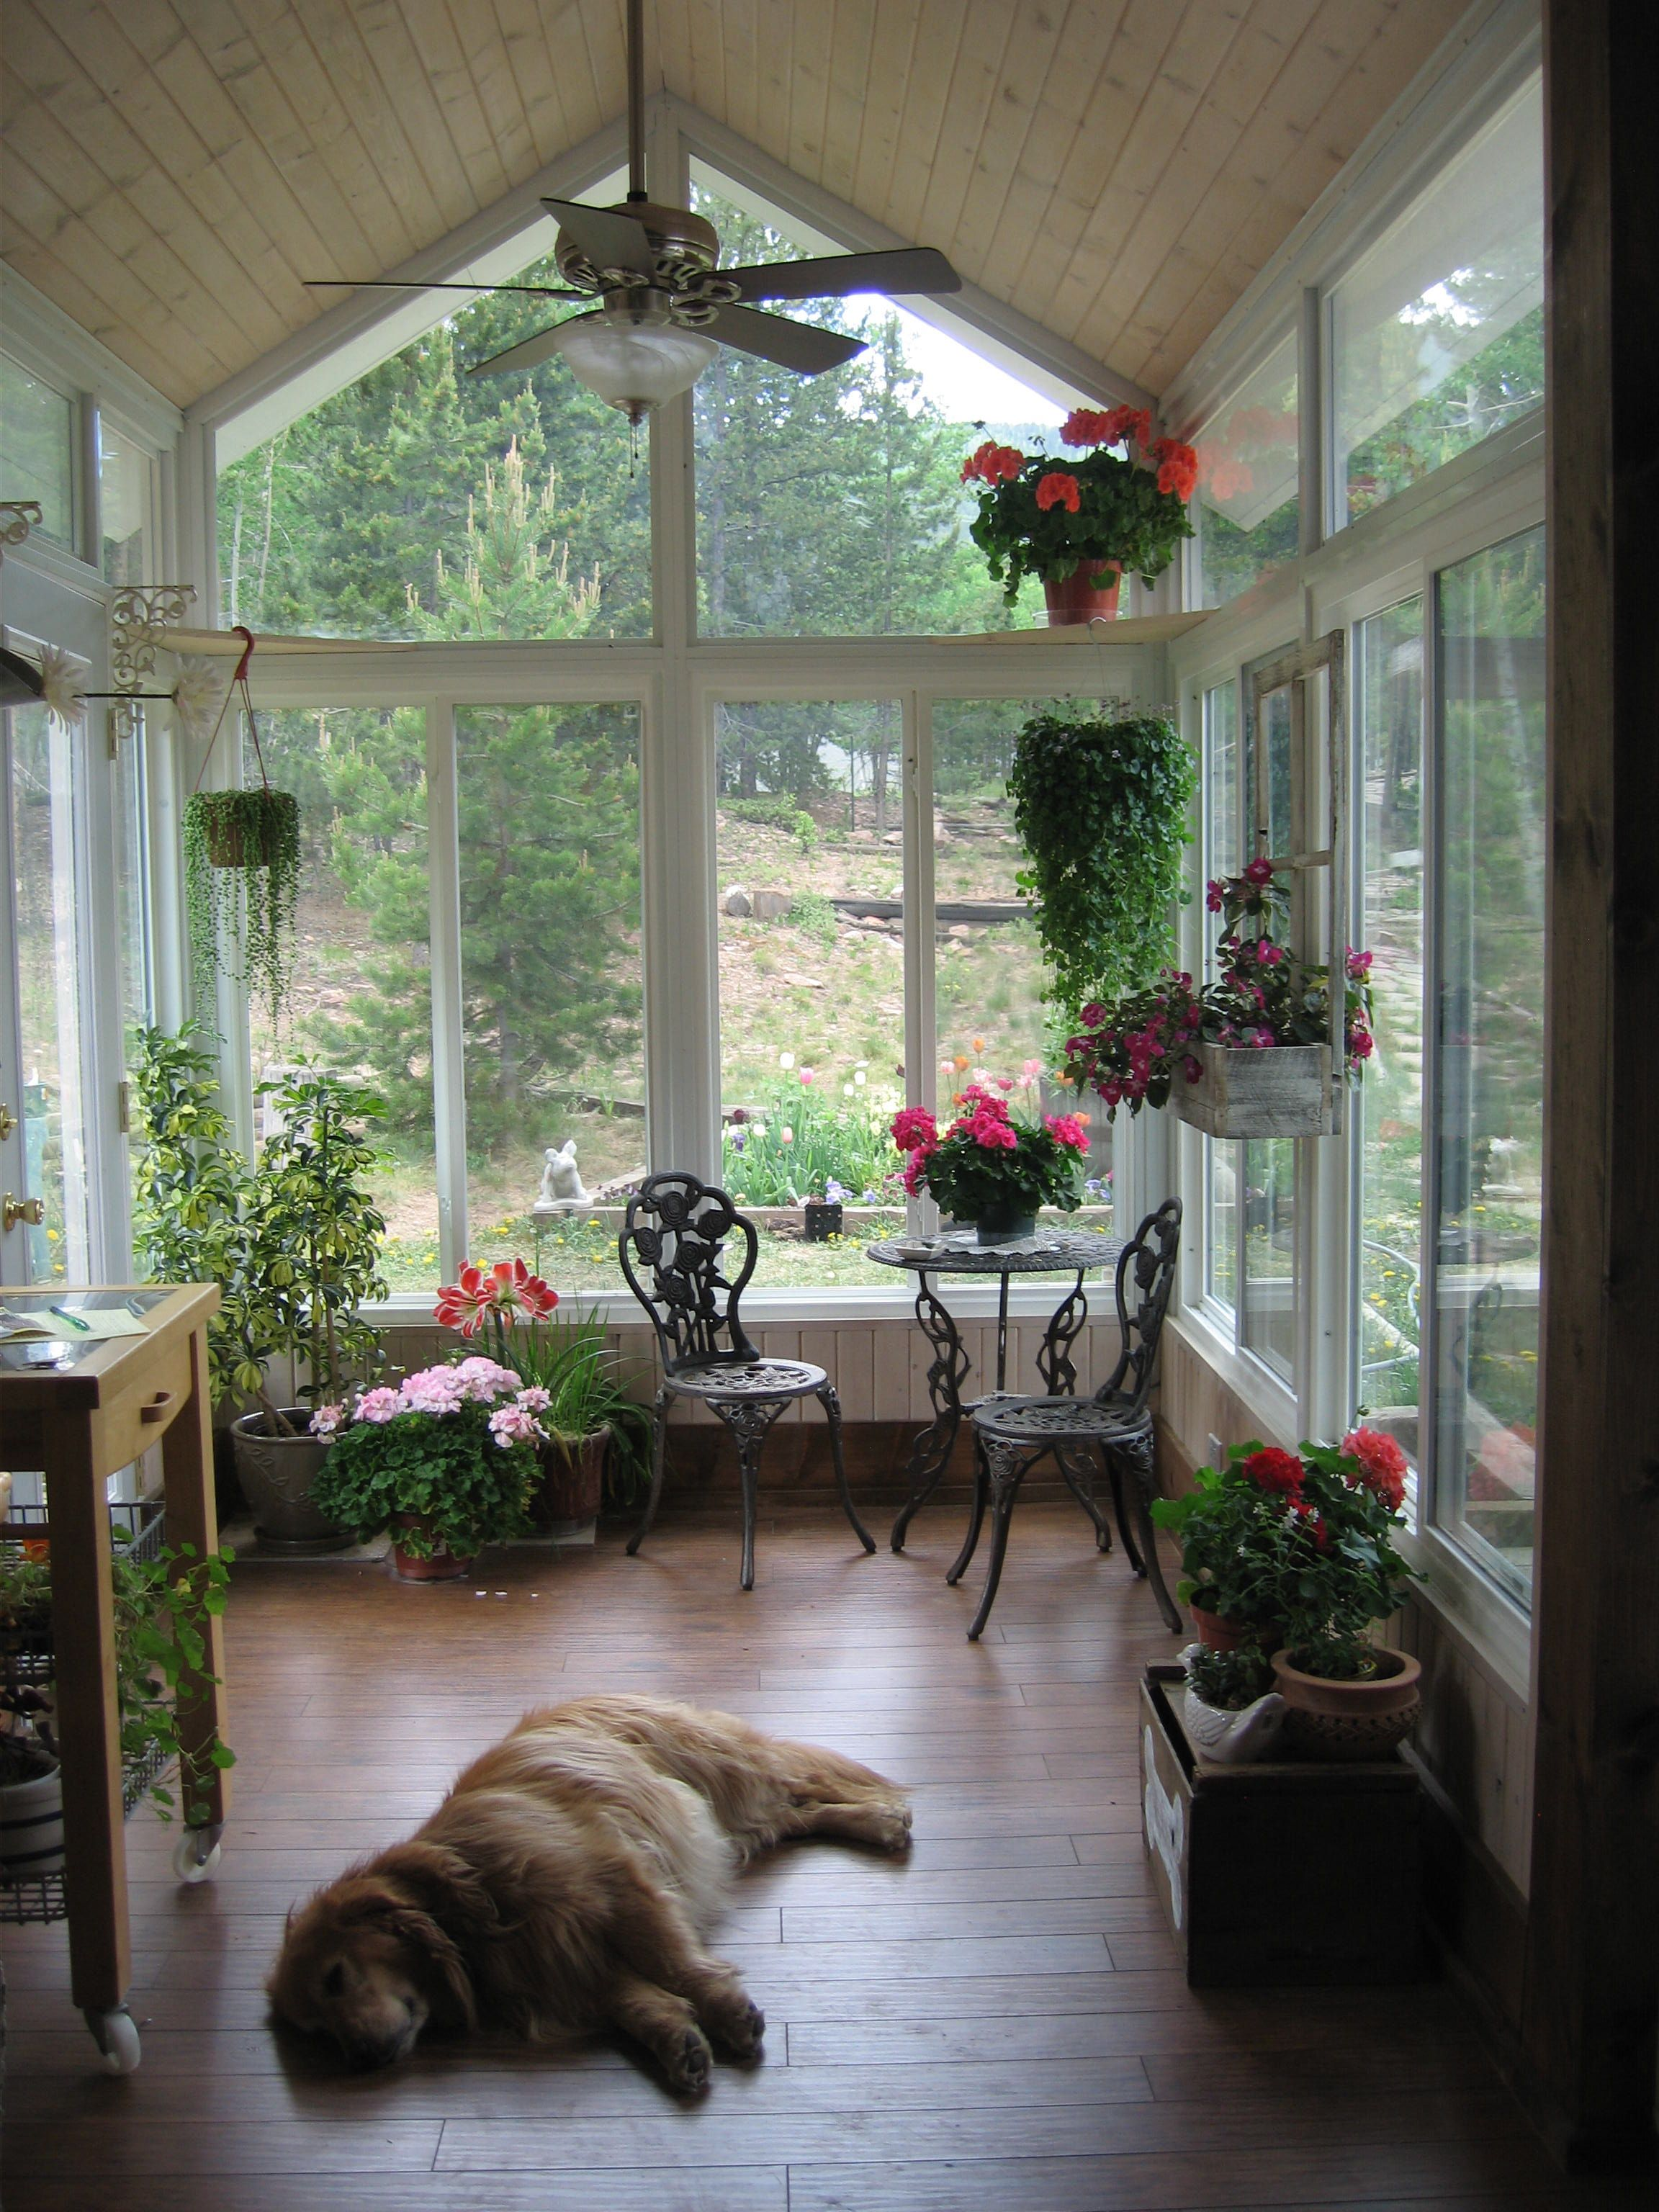 4 Season Sun Porches Sun Room Ideas Plans Photos Sunrooms By